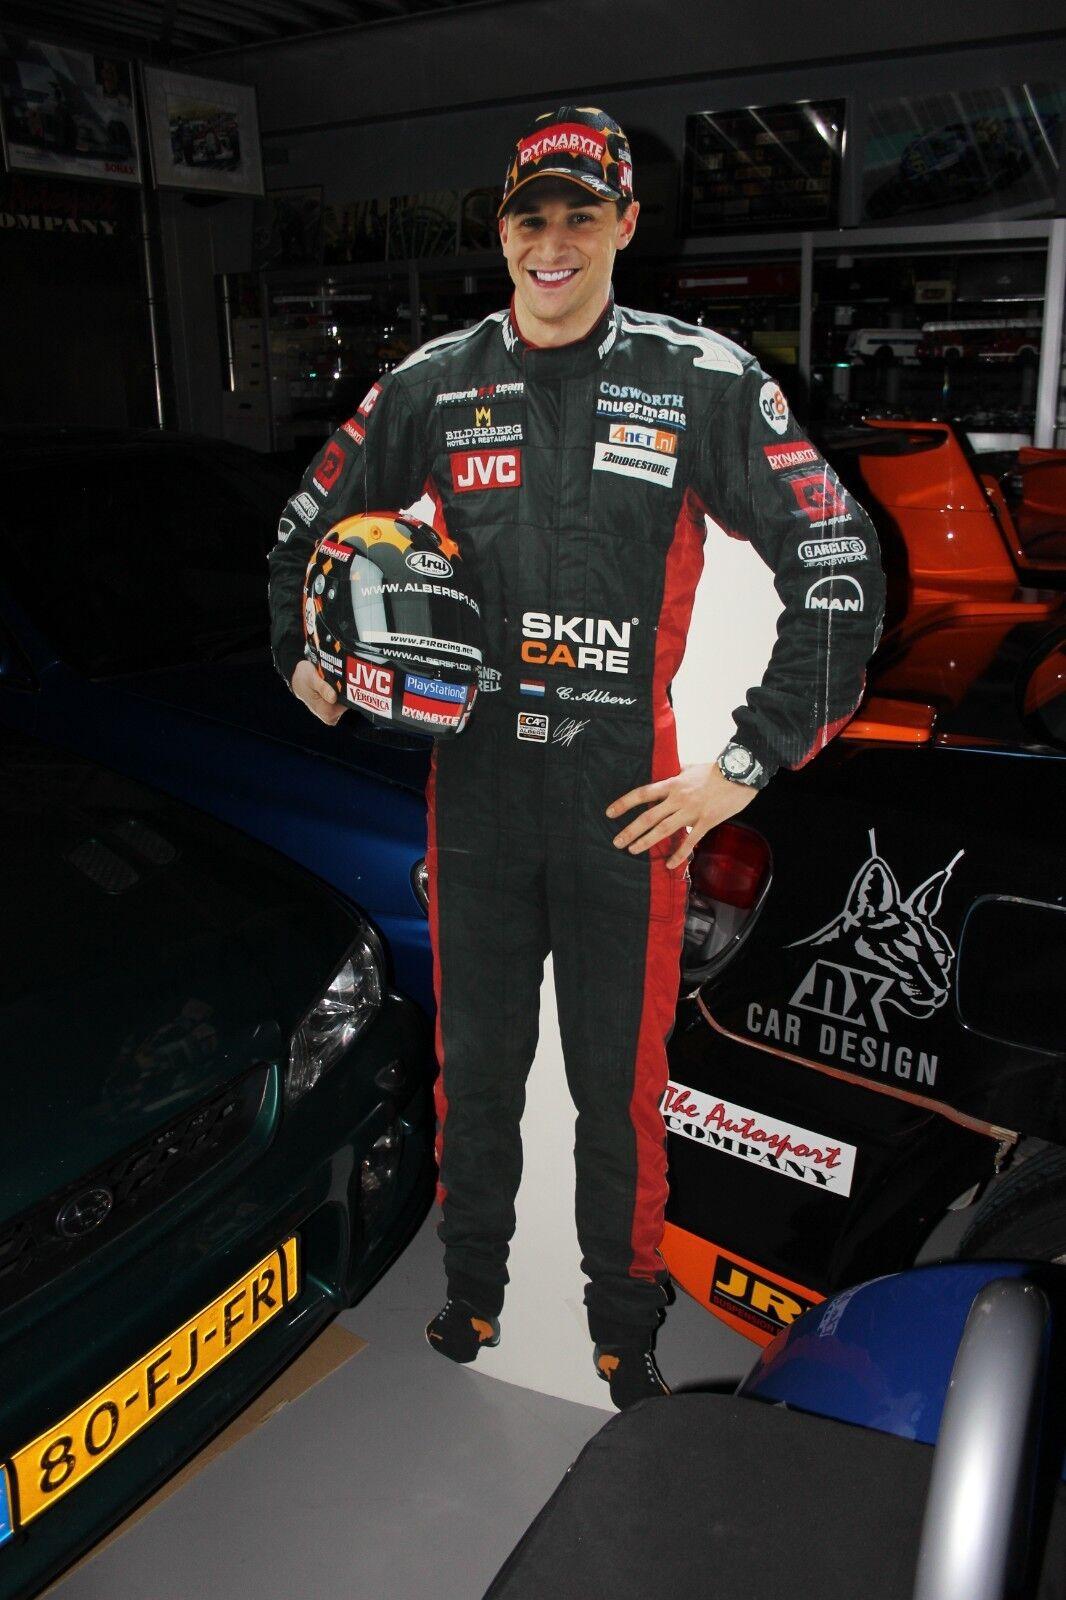 marca Cochedboard Figurine Figurine Figurine Christijan Albers European Minardi Team (height 182 cm)  en promociones de estadios